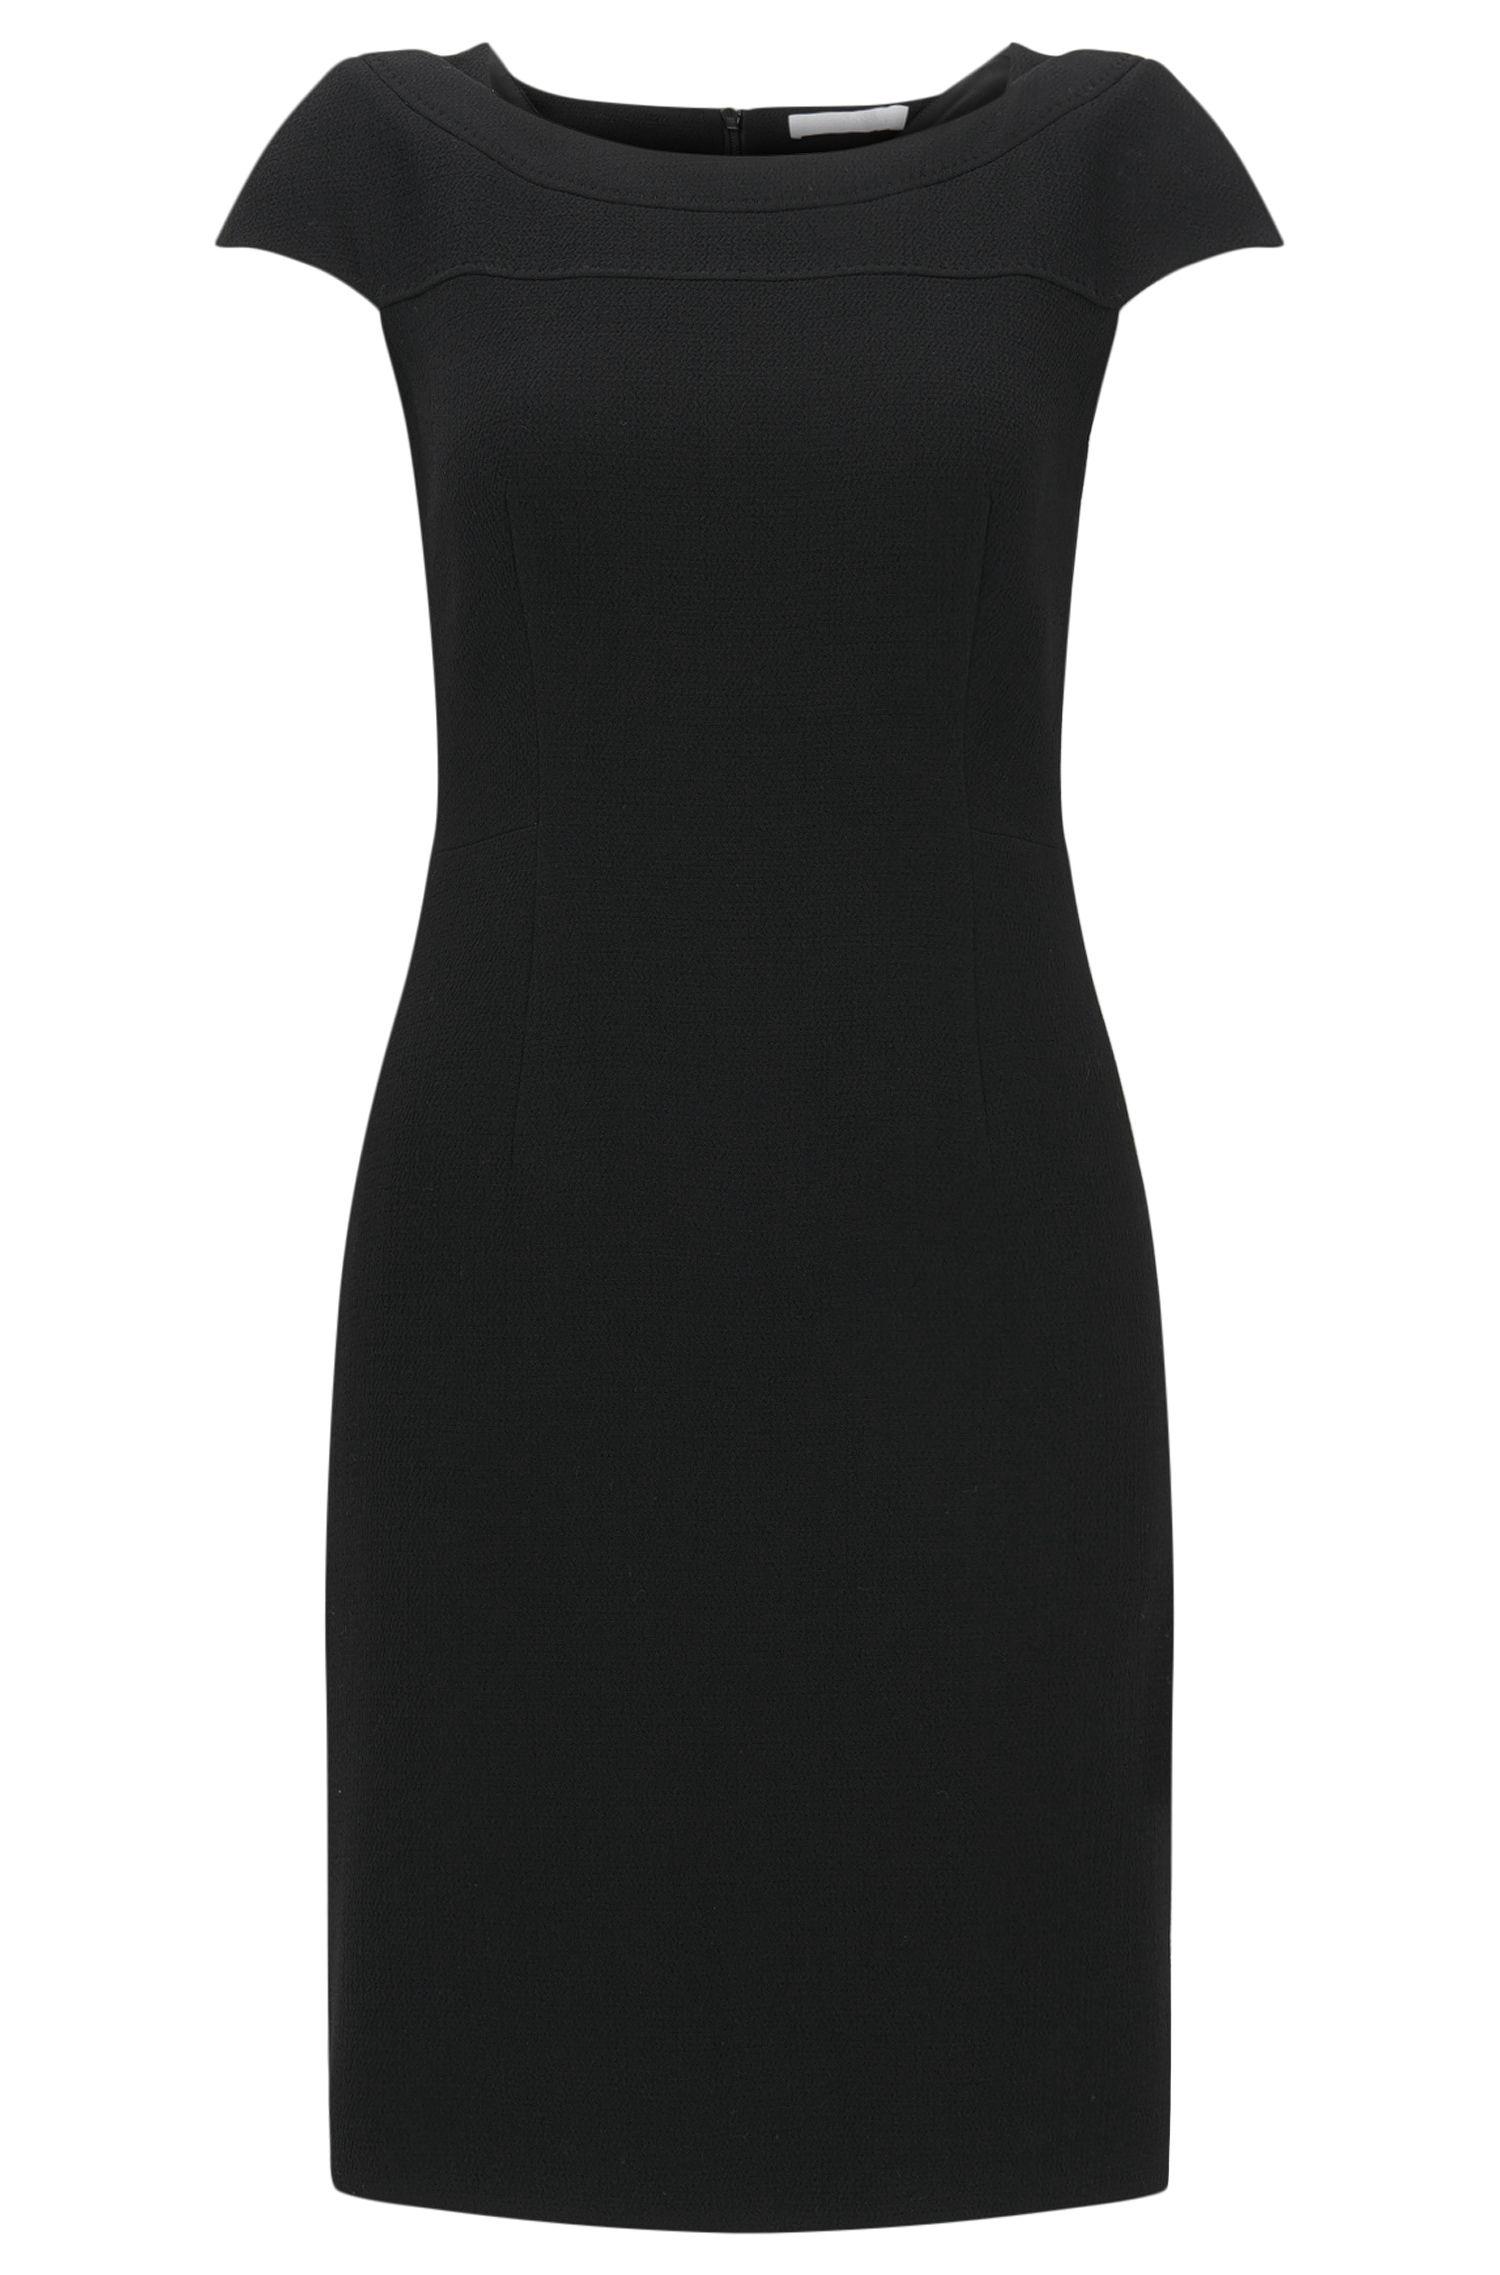 Virgin Wool Blend Sheath Dress | Dalikana